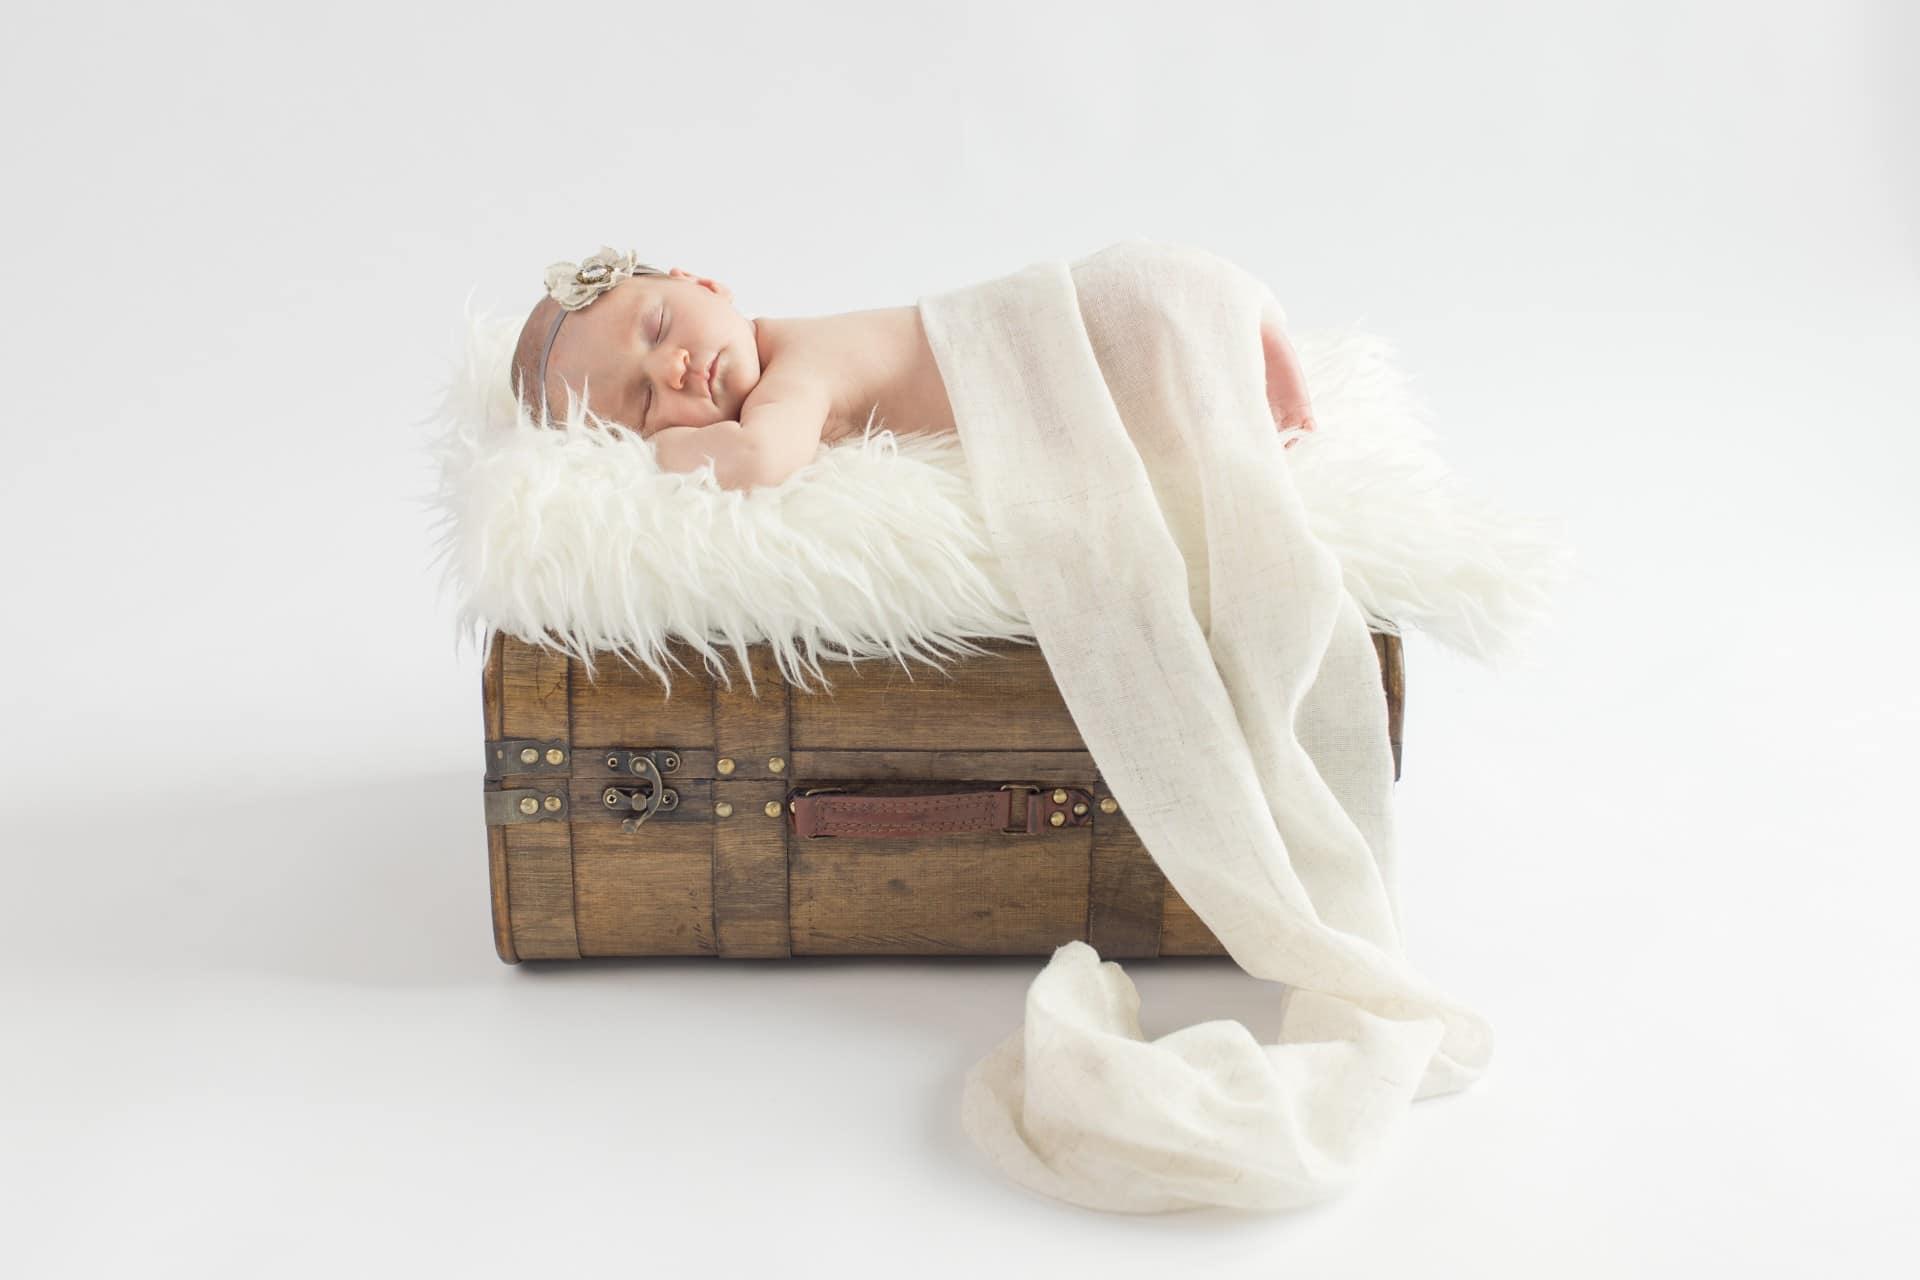 133-Tania-Flores-Photography-Babyfotos-QEa4RlEF